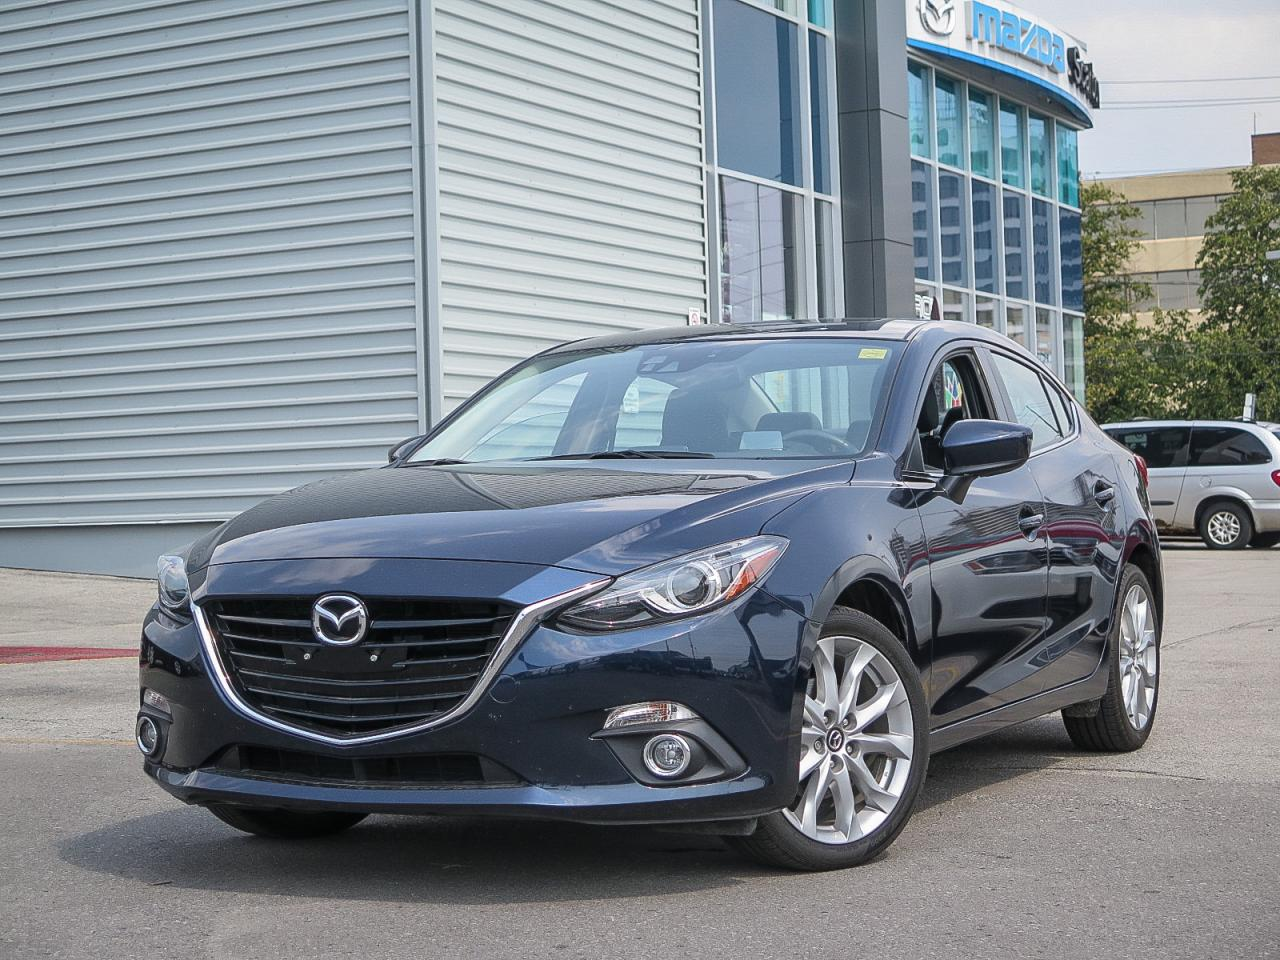 2014 Mazda MAZDA3 GT TECH FINANCE @0.9%